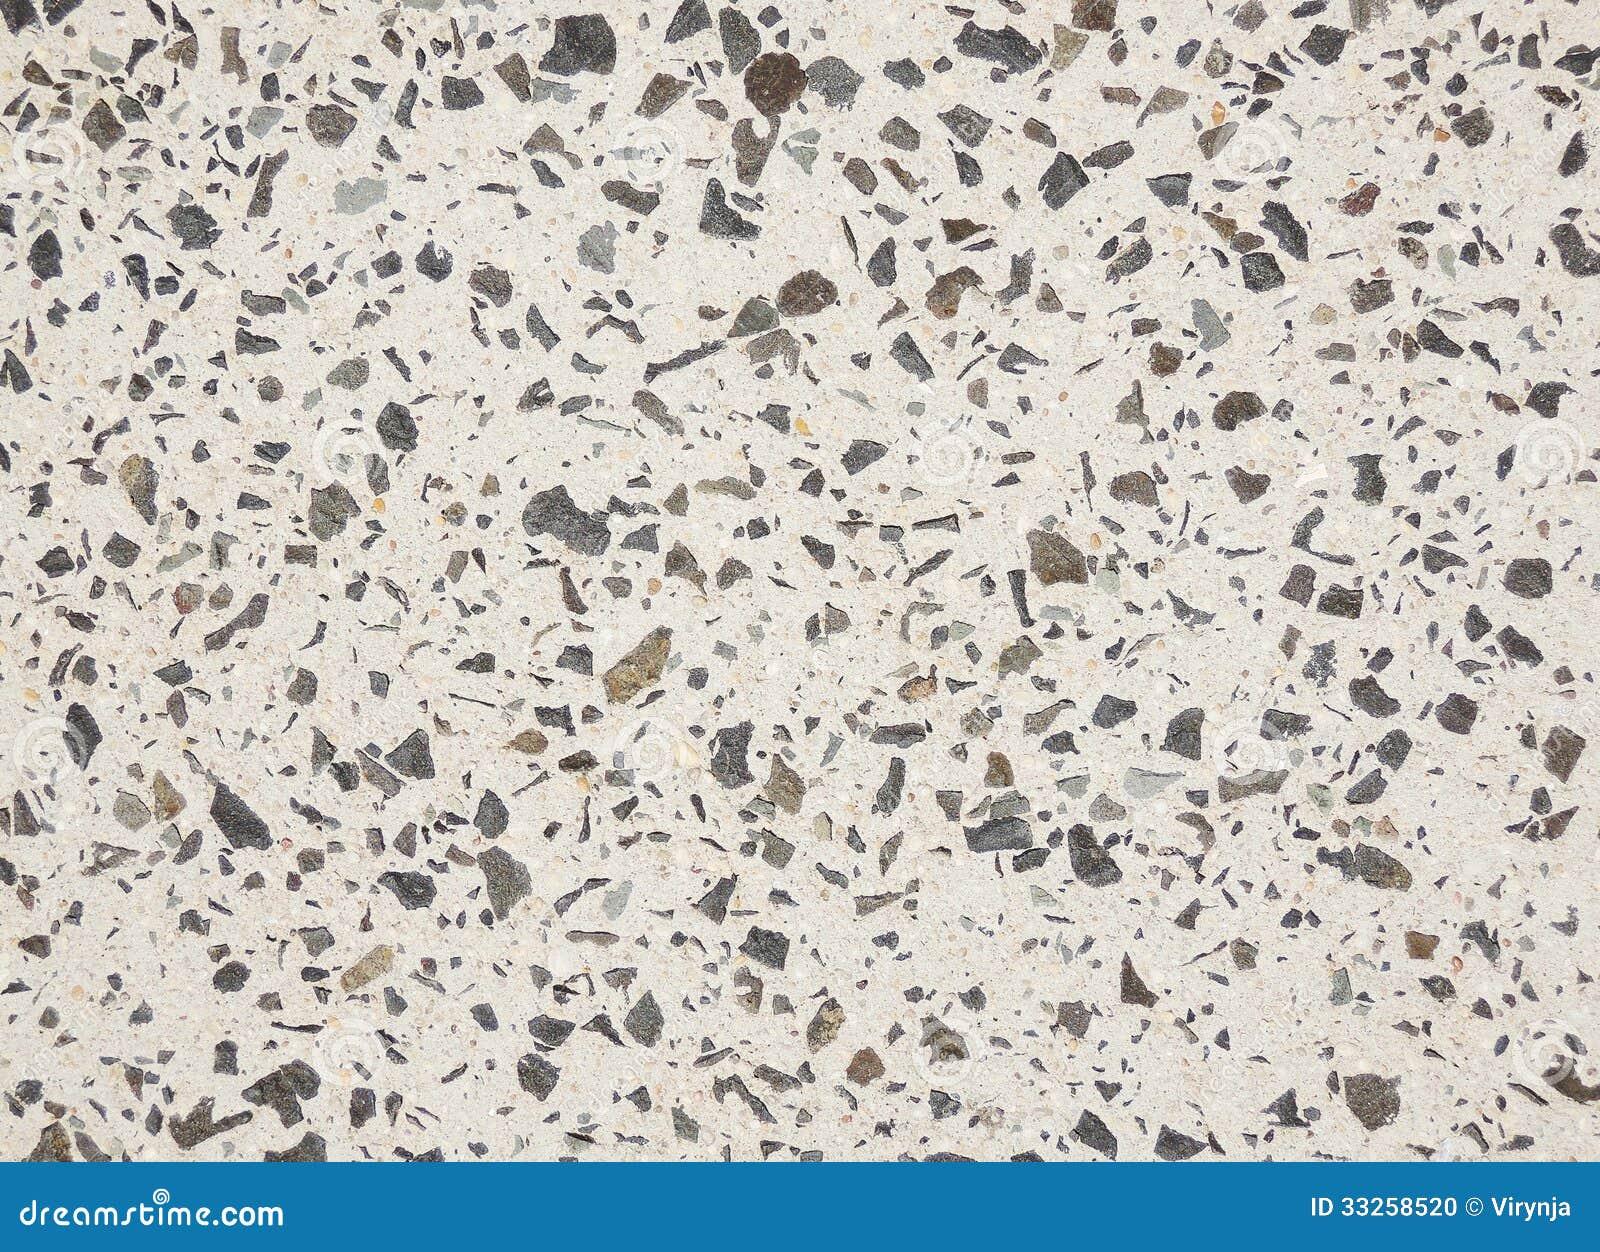 Stone floor texture stock photo image 33258520 for Piedra de granito